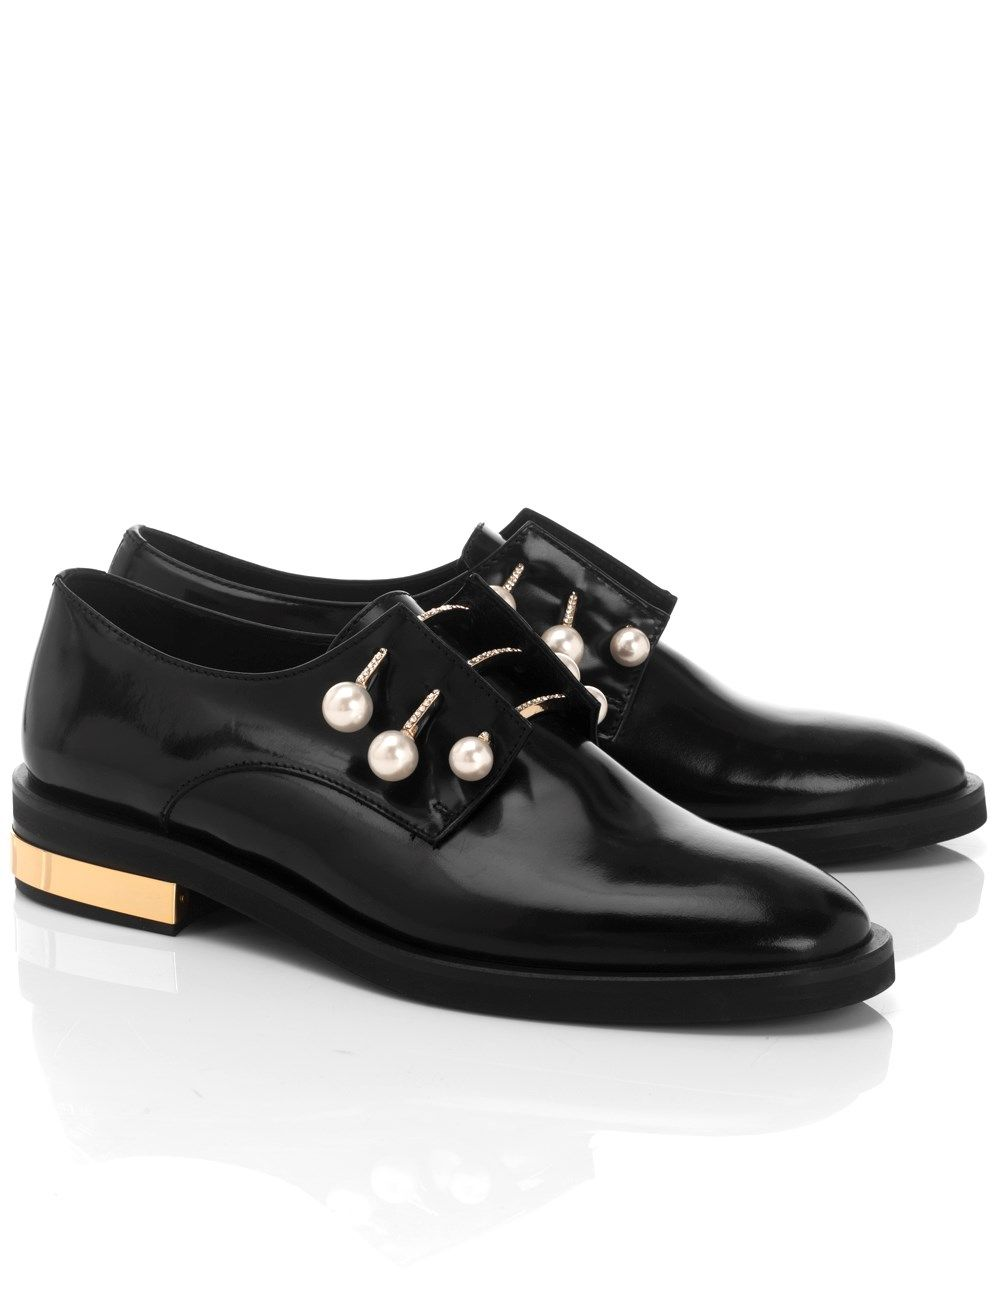 Slip on Sneakers for Women On Sale, Gunmetal, Patent Leather, 2017, 6 Coliac di Martina Grasselli